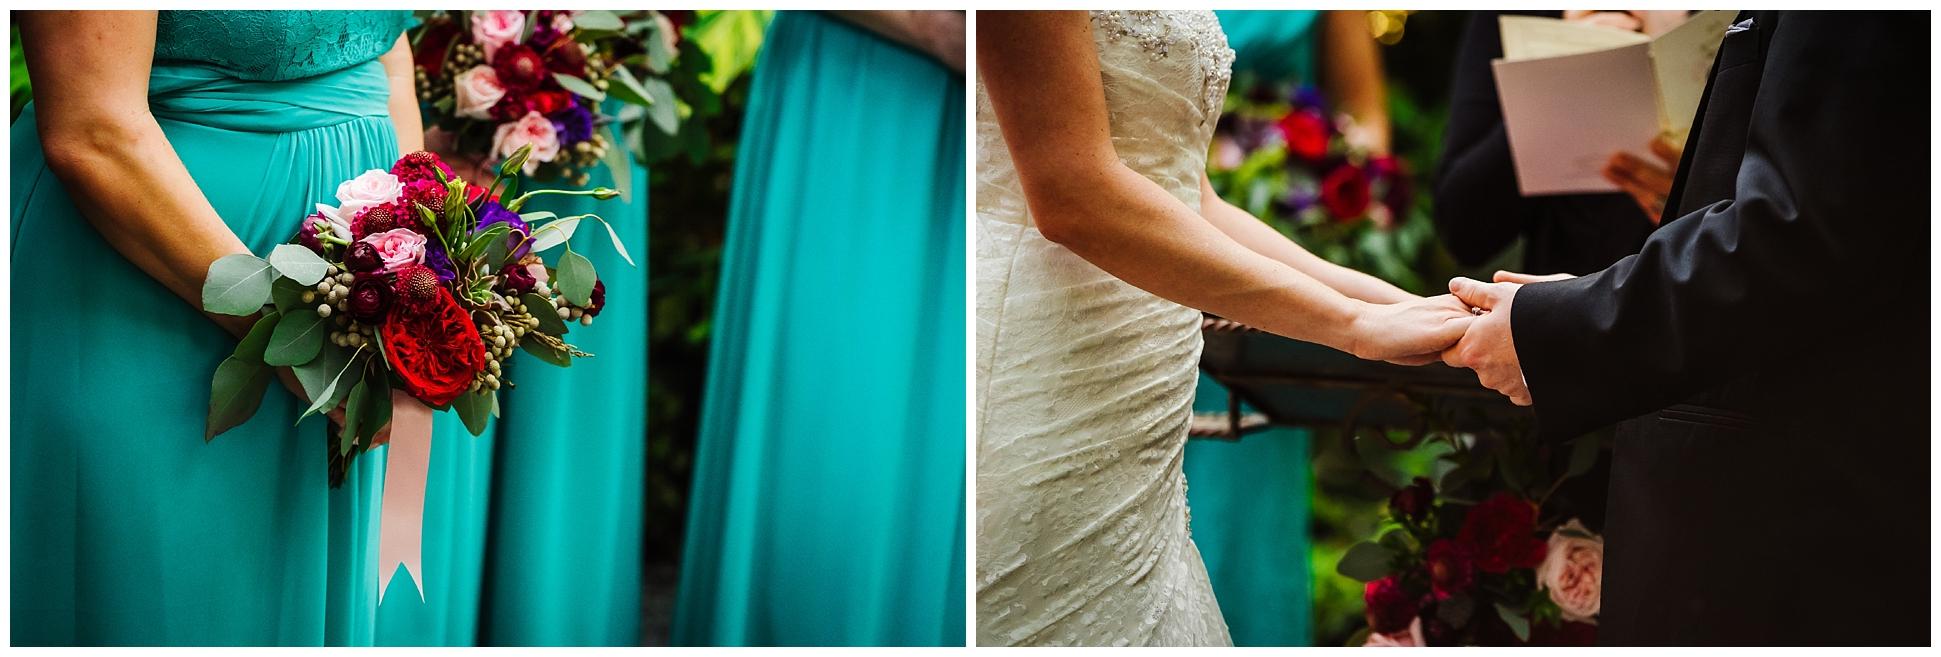 florida-destination-wedding-photographer-enchanted-tropical-miami-homestead-cooper-estate-teal_0048.jpg